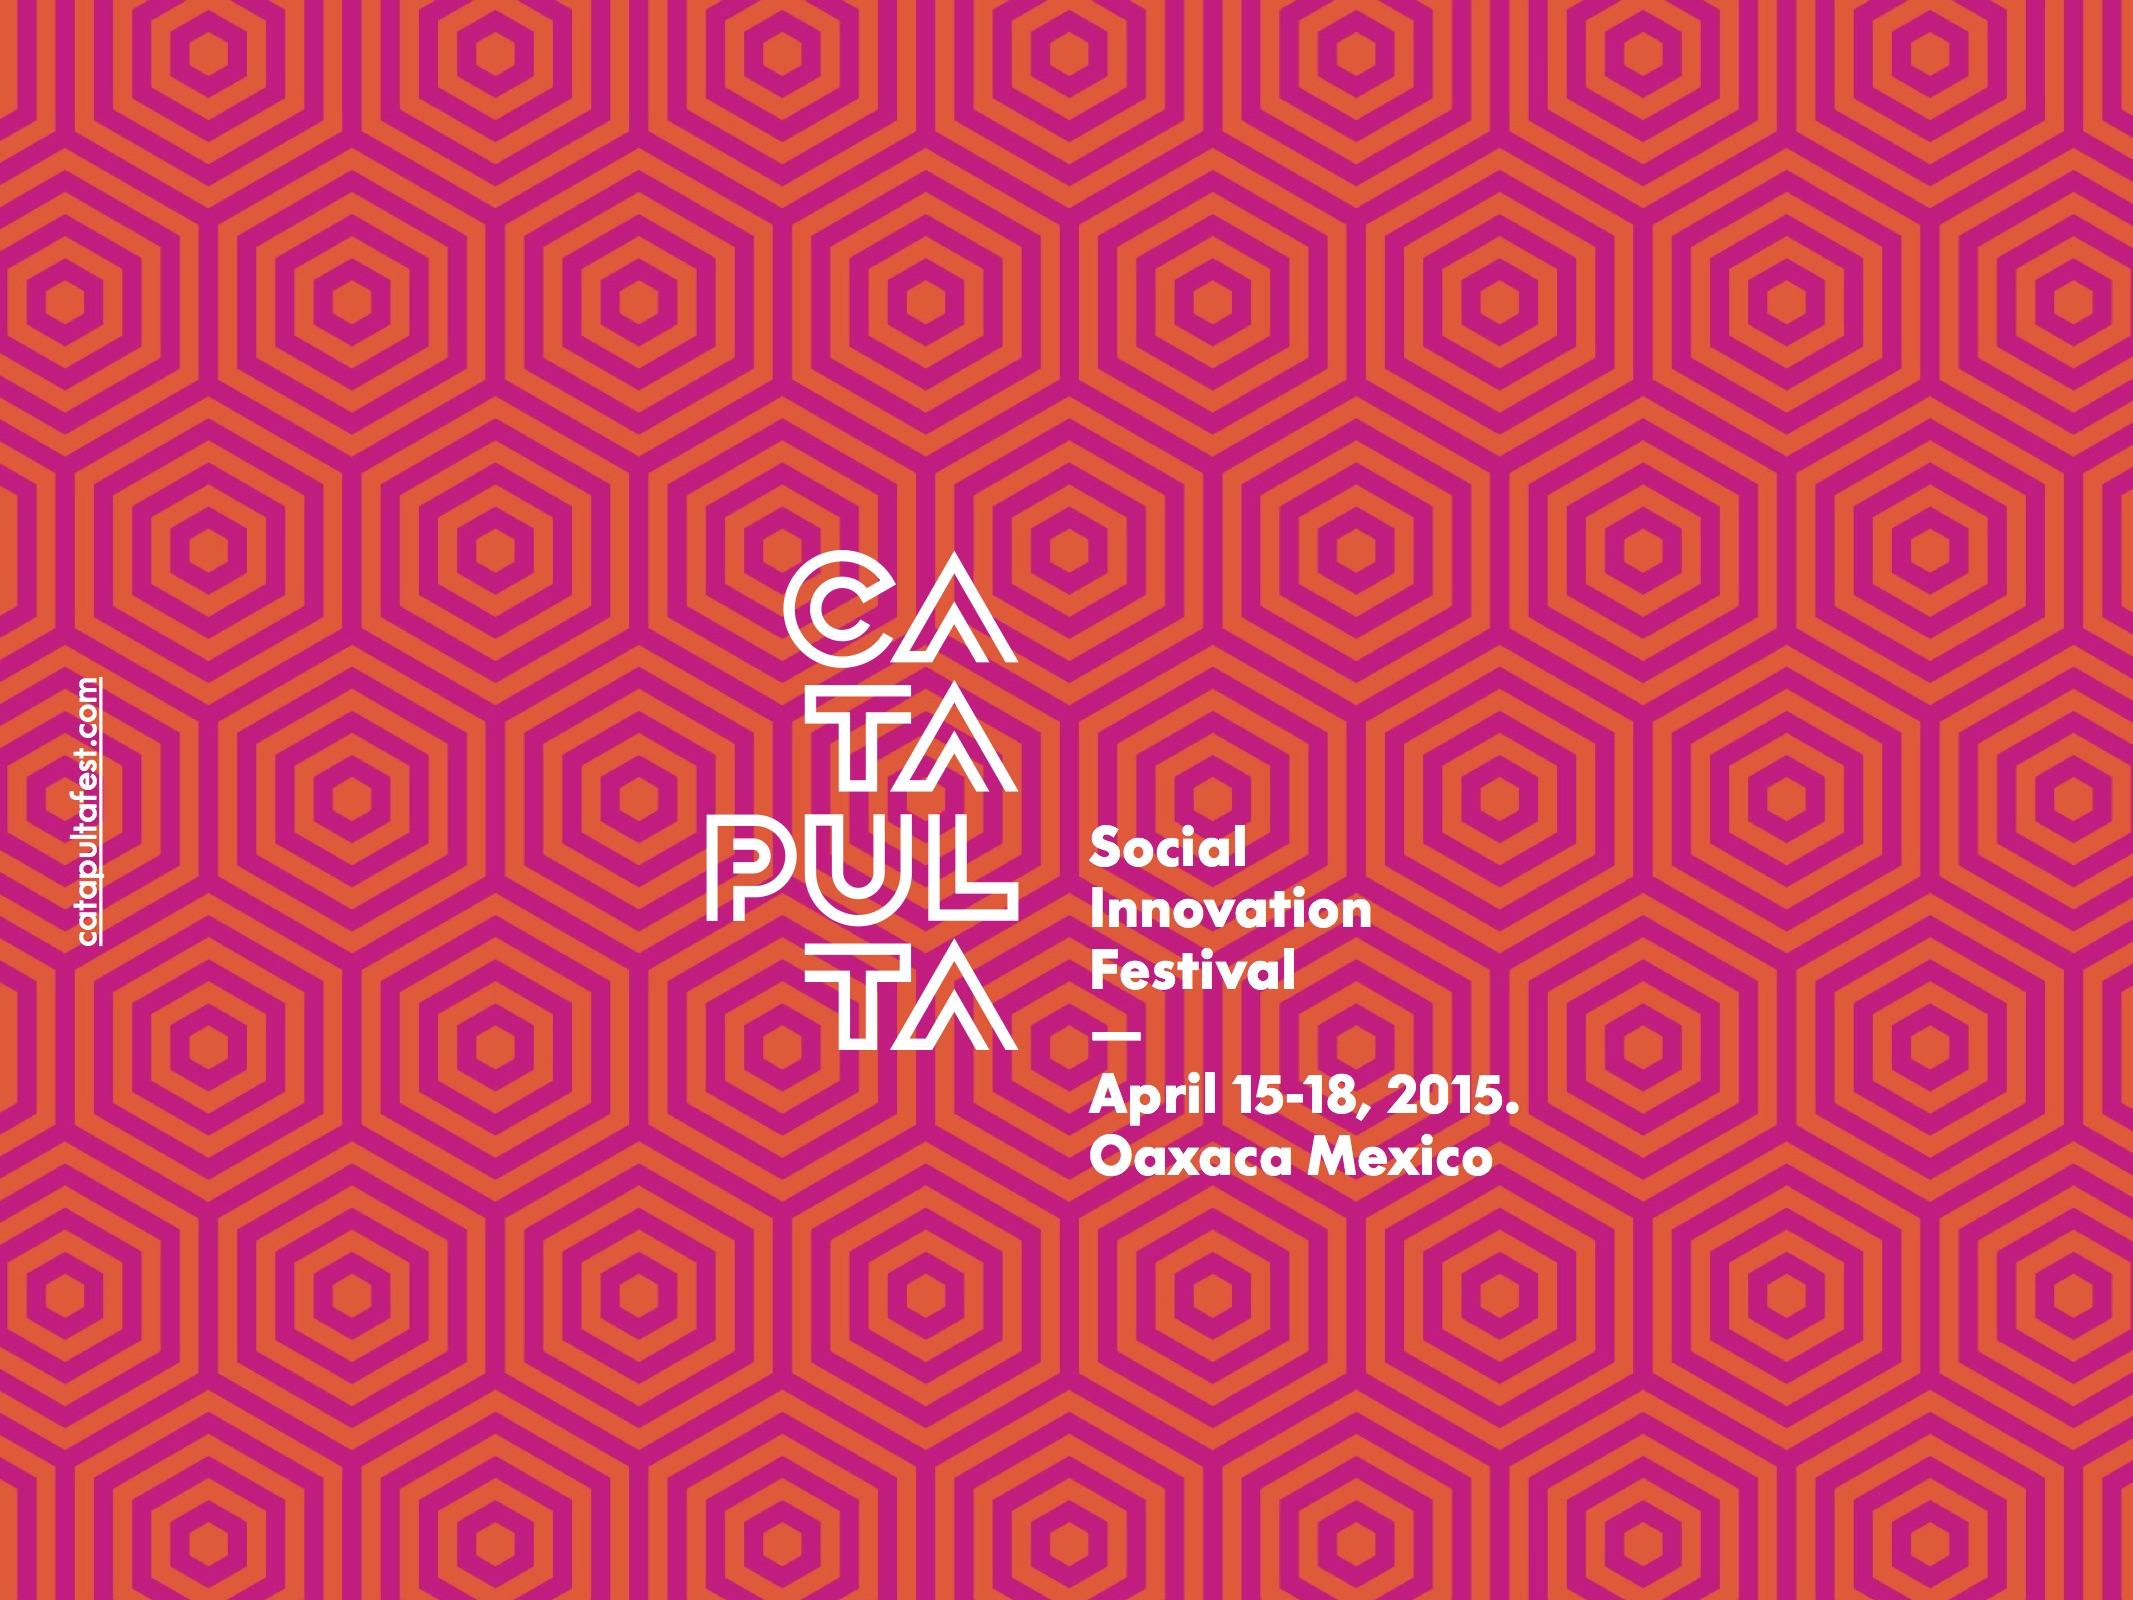 ABOUT-CATAPULTA21.jpg